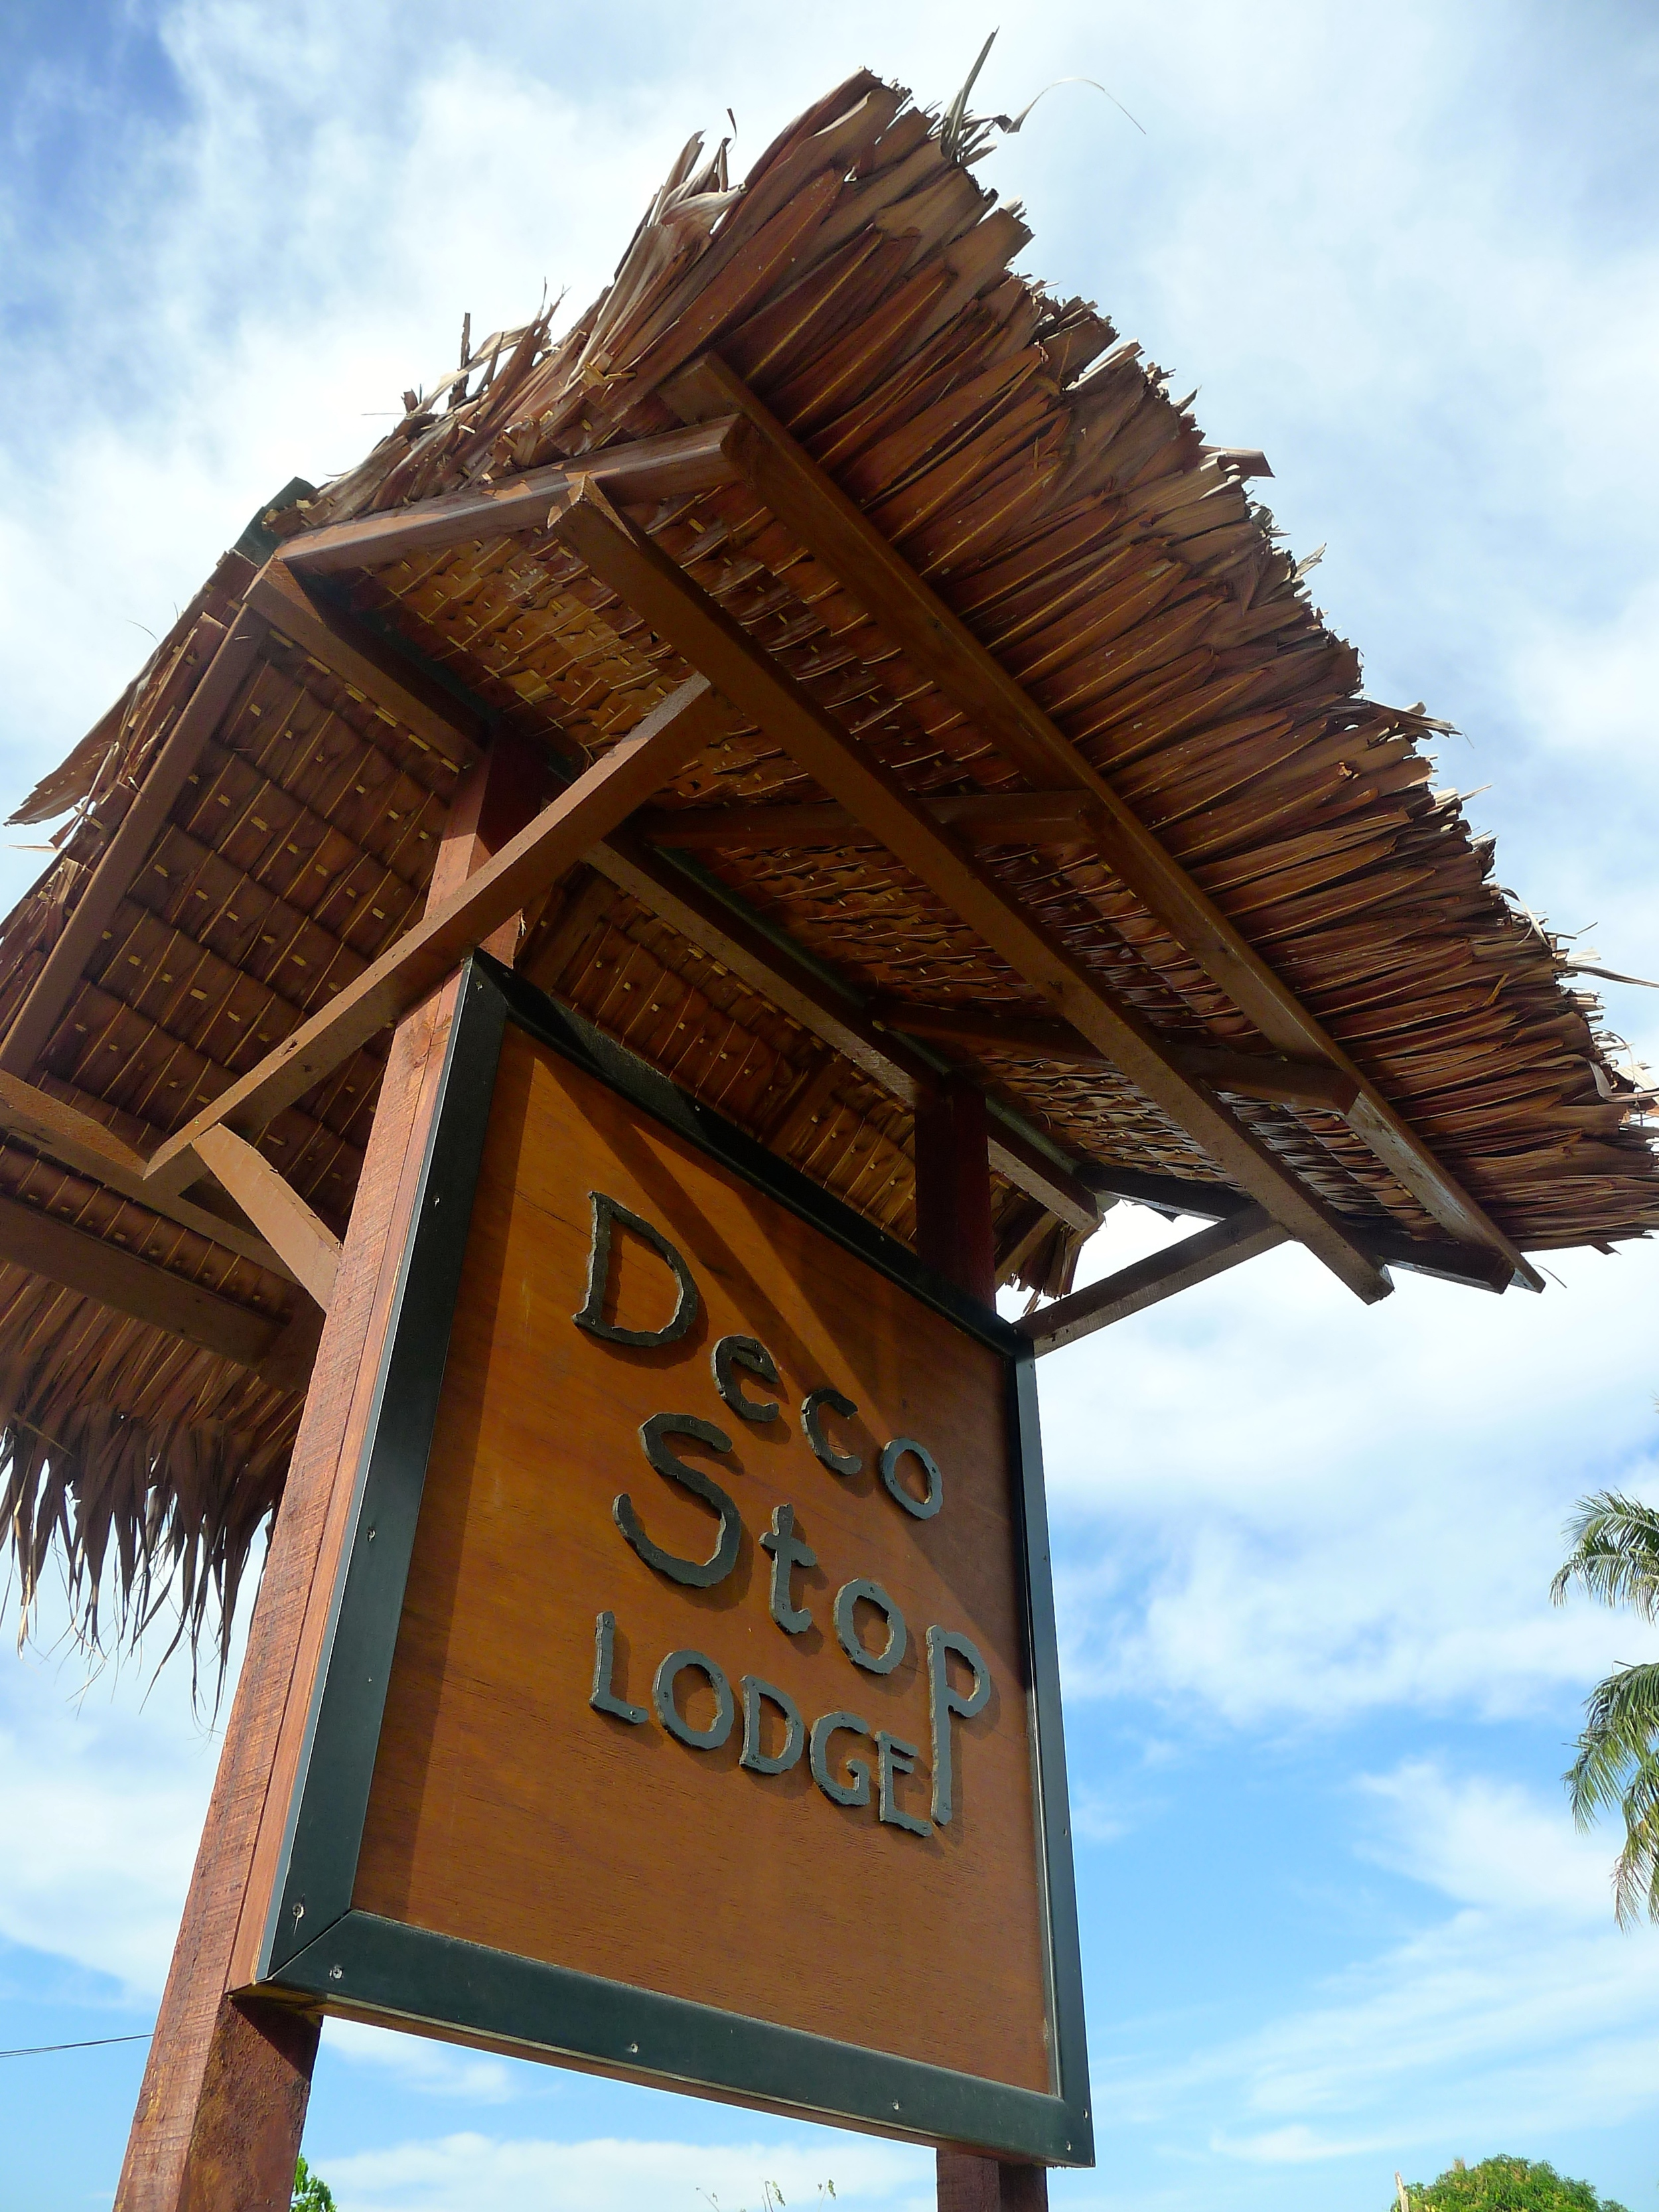 DECO STOP LODGE, SANTO VANUATU